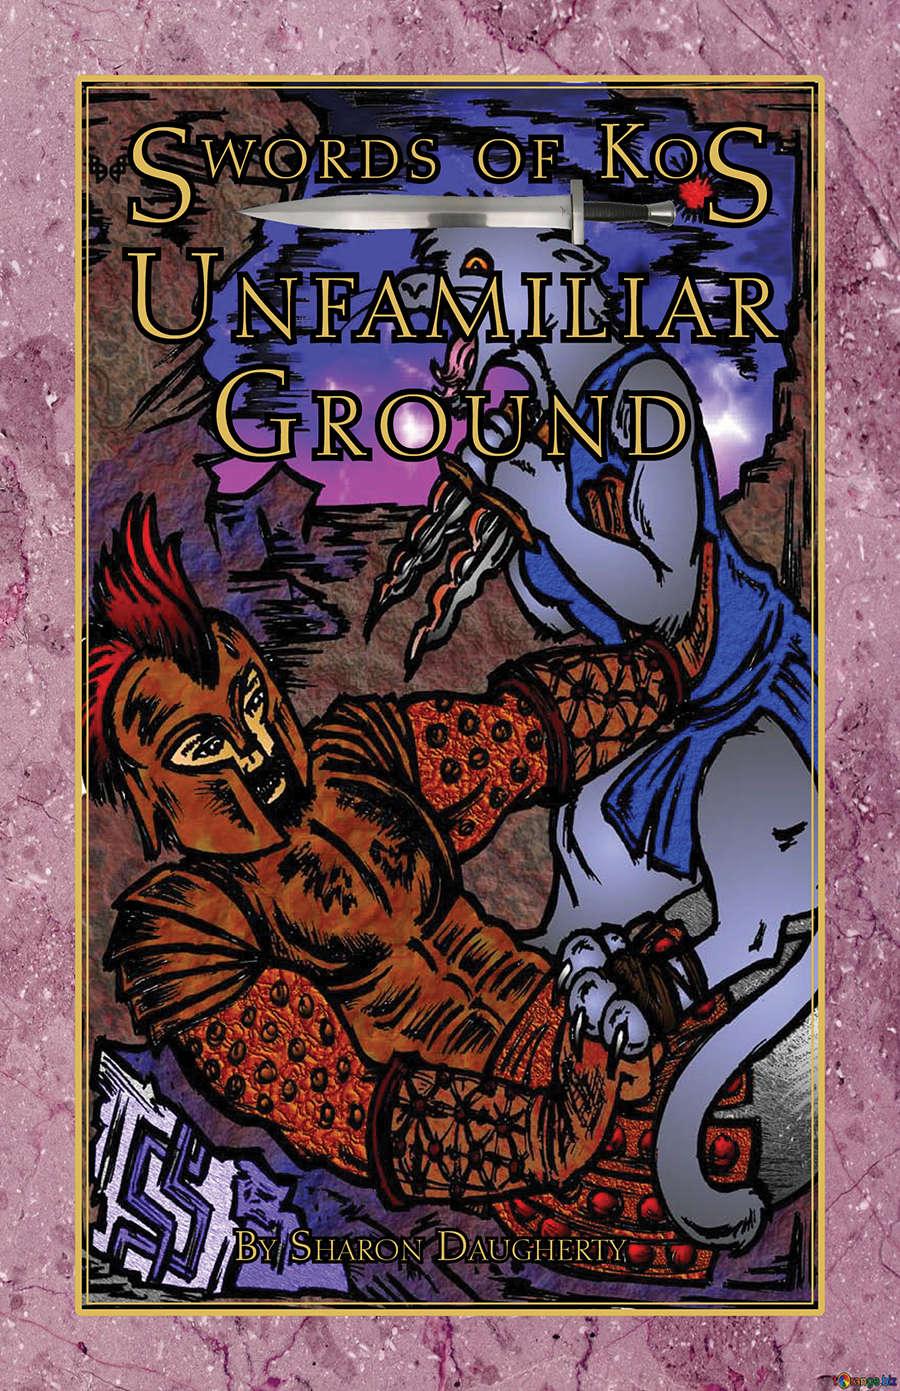 Swords of Kos: Unfamiliar Ground